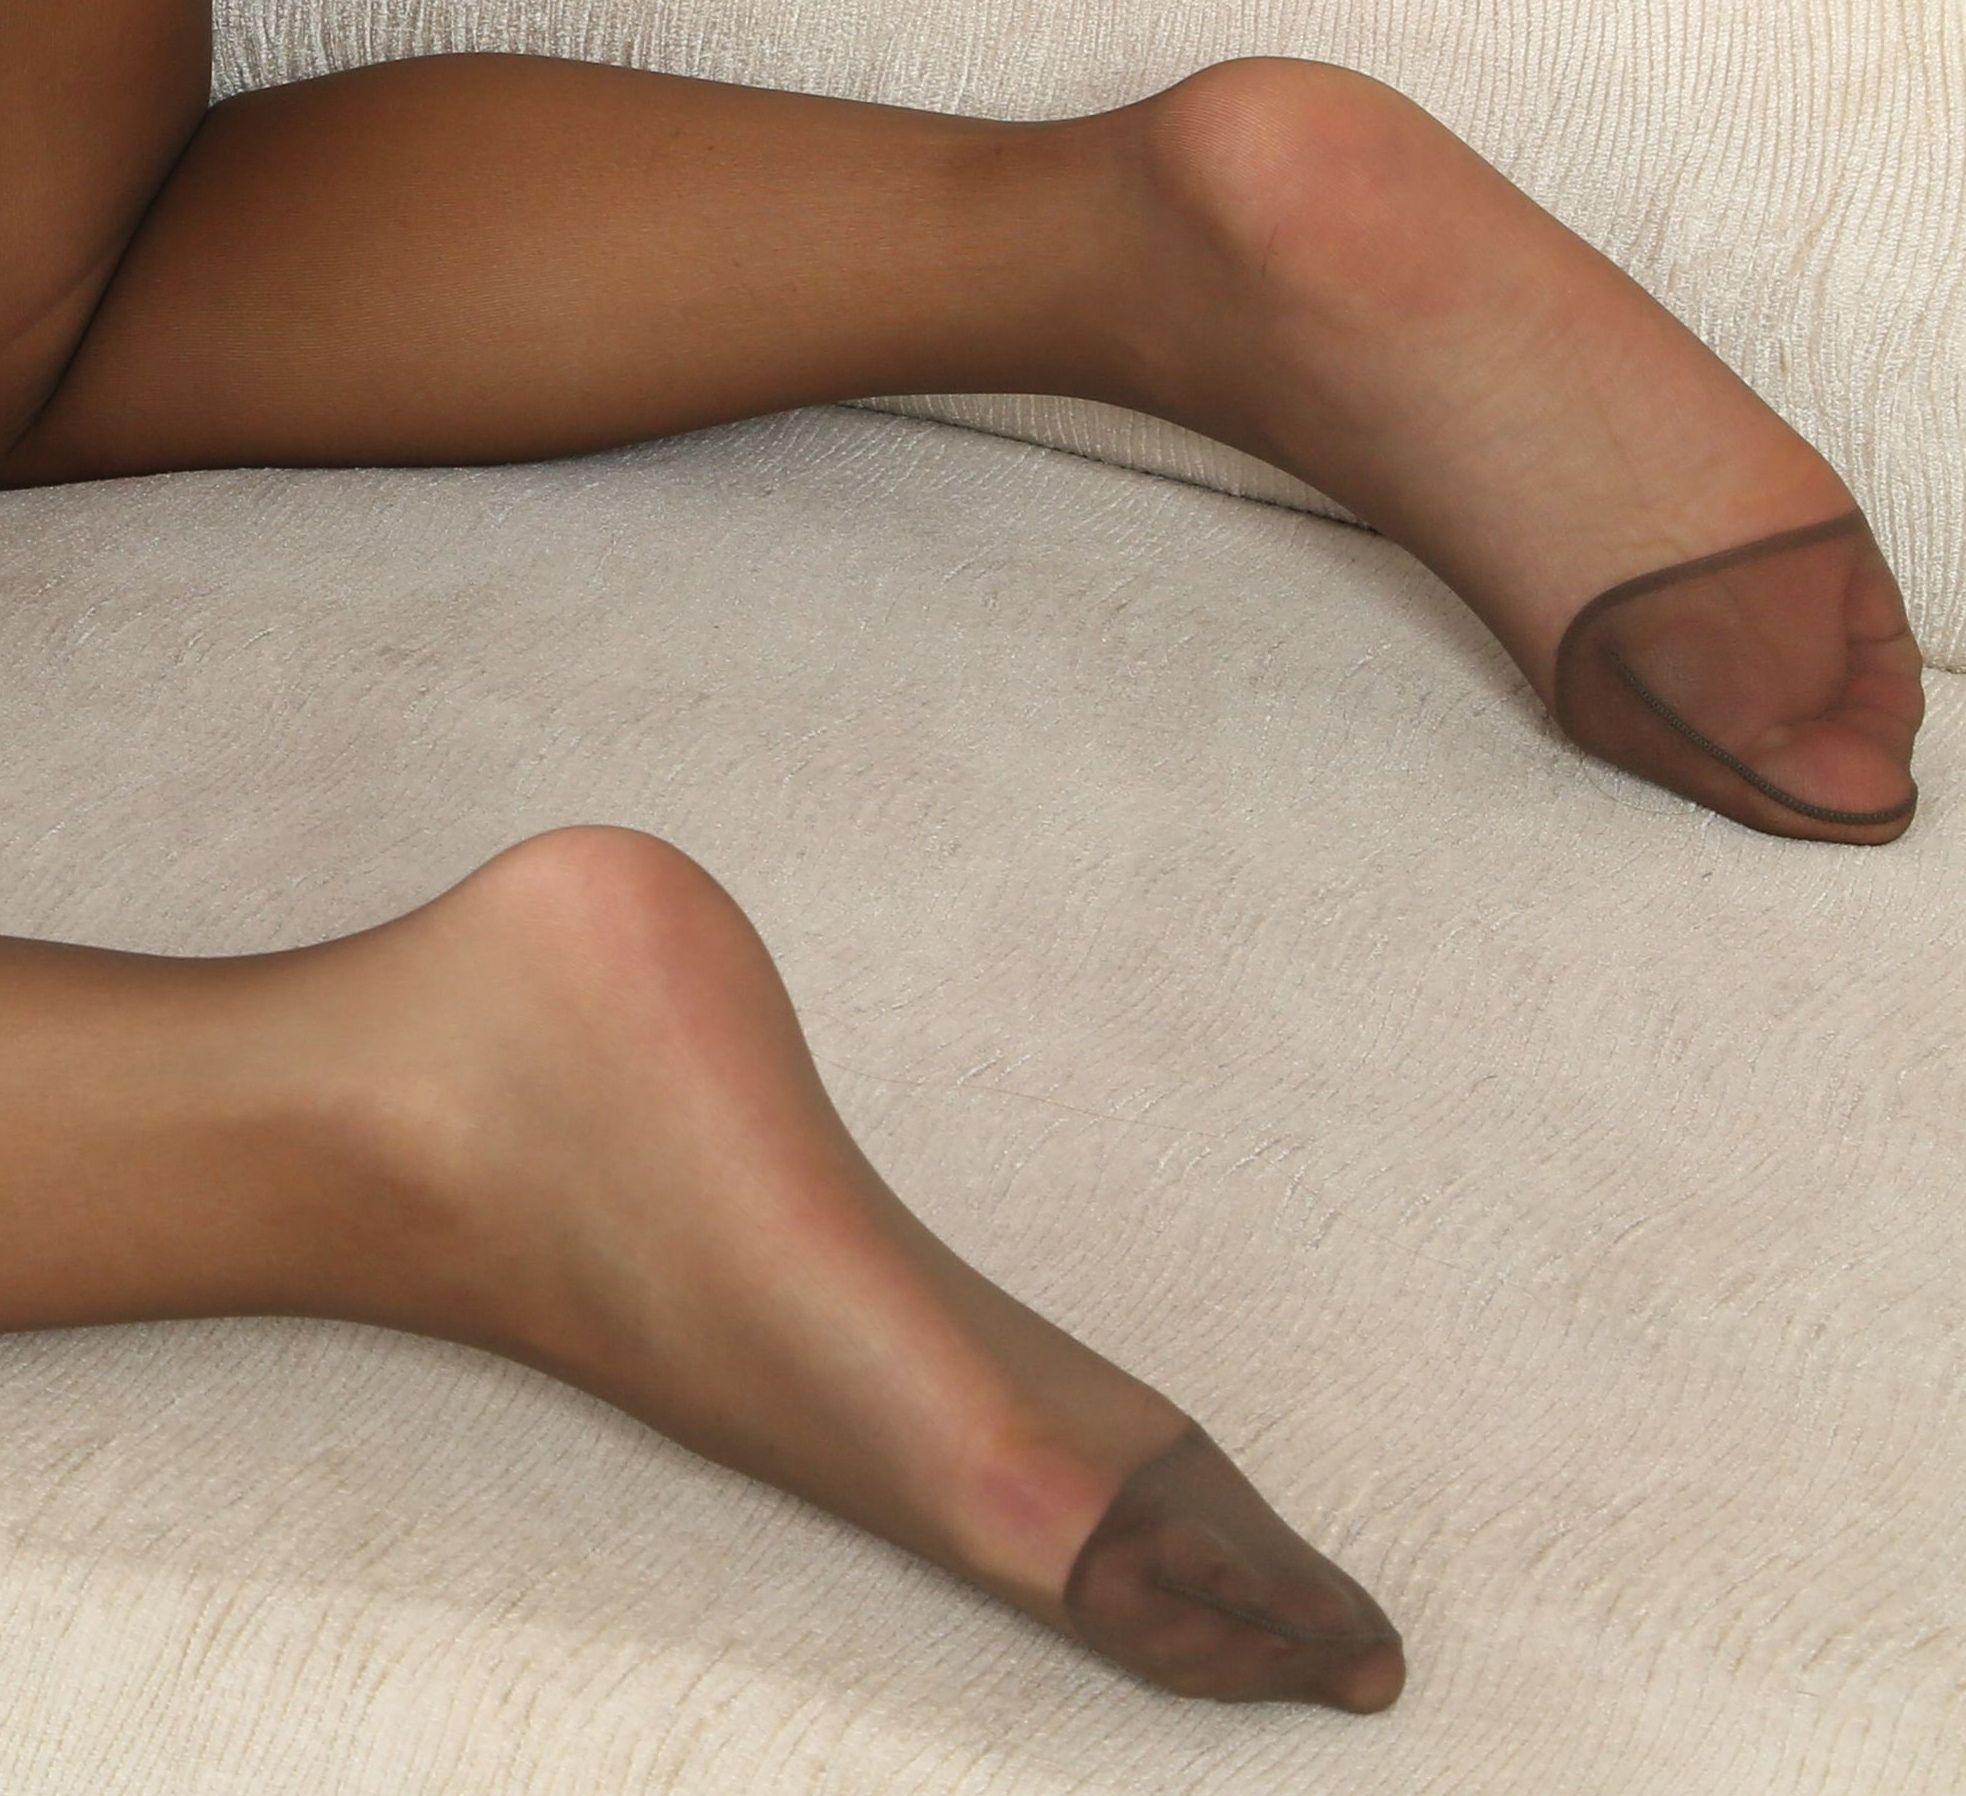 footfetish dating